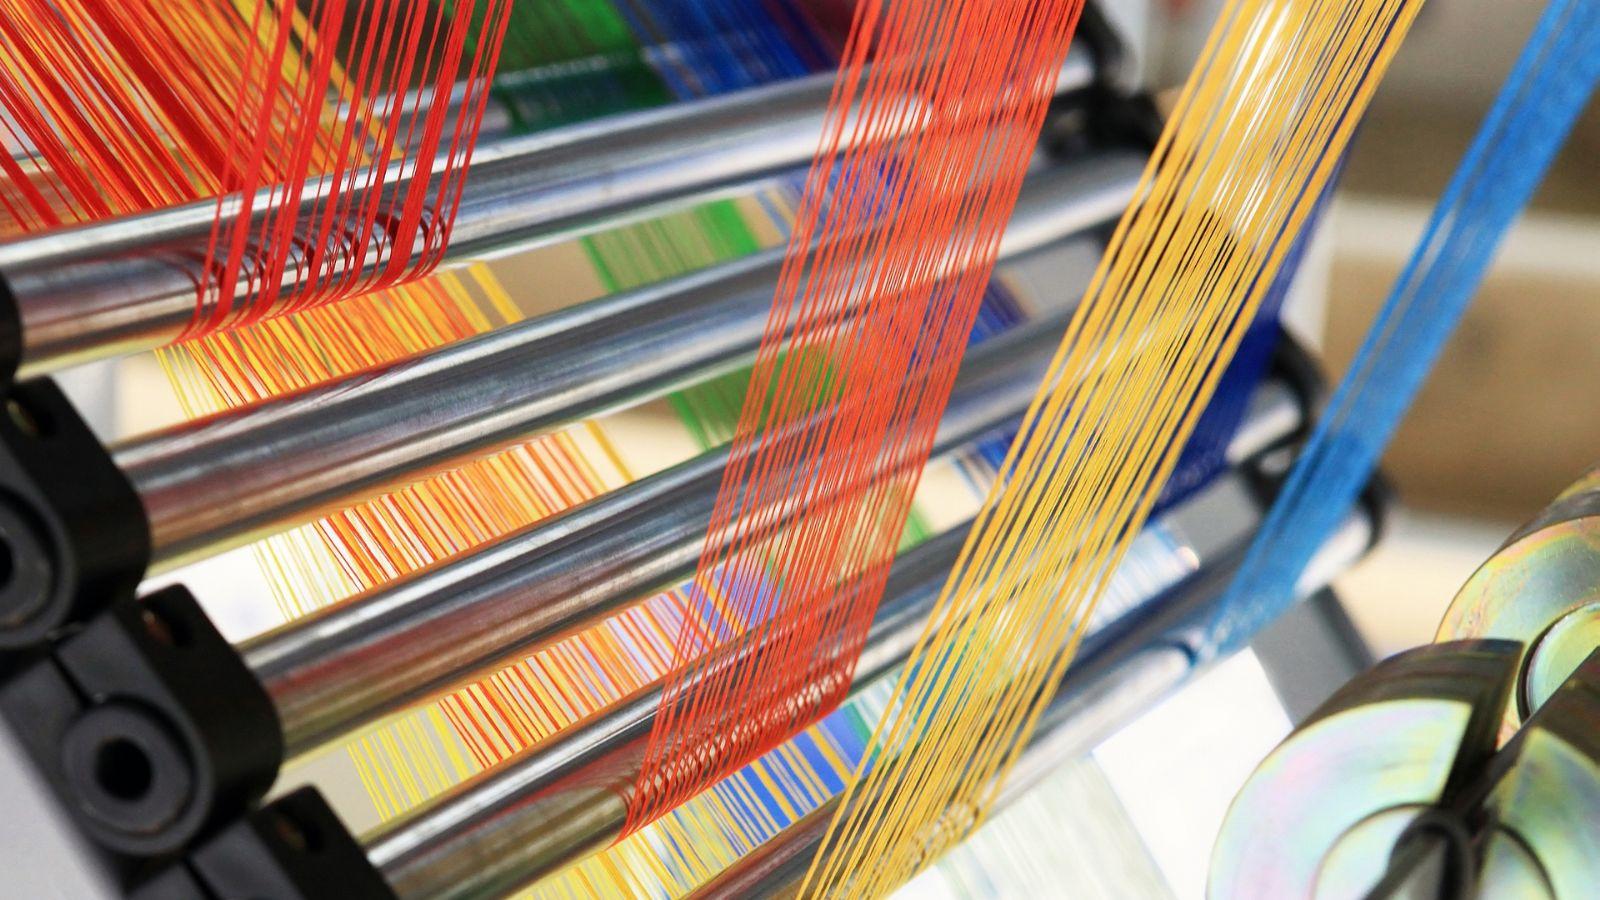 Control de calidad en la industria textil; pruebas de fibra